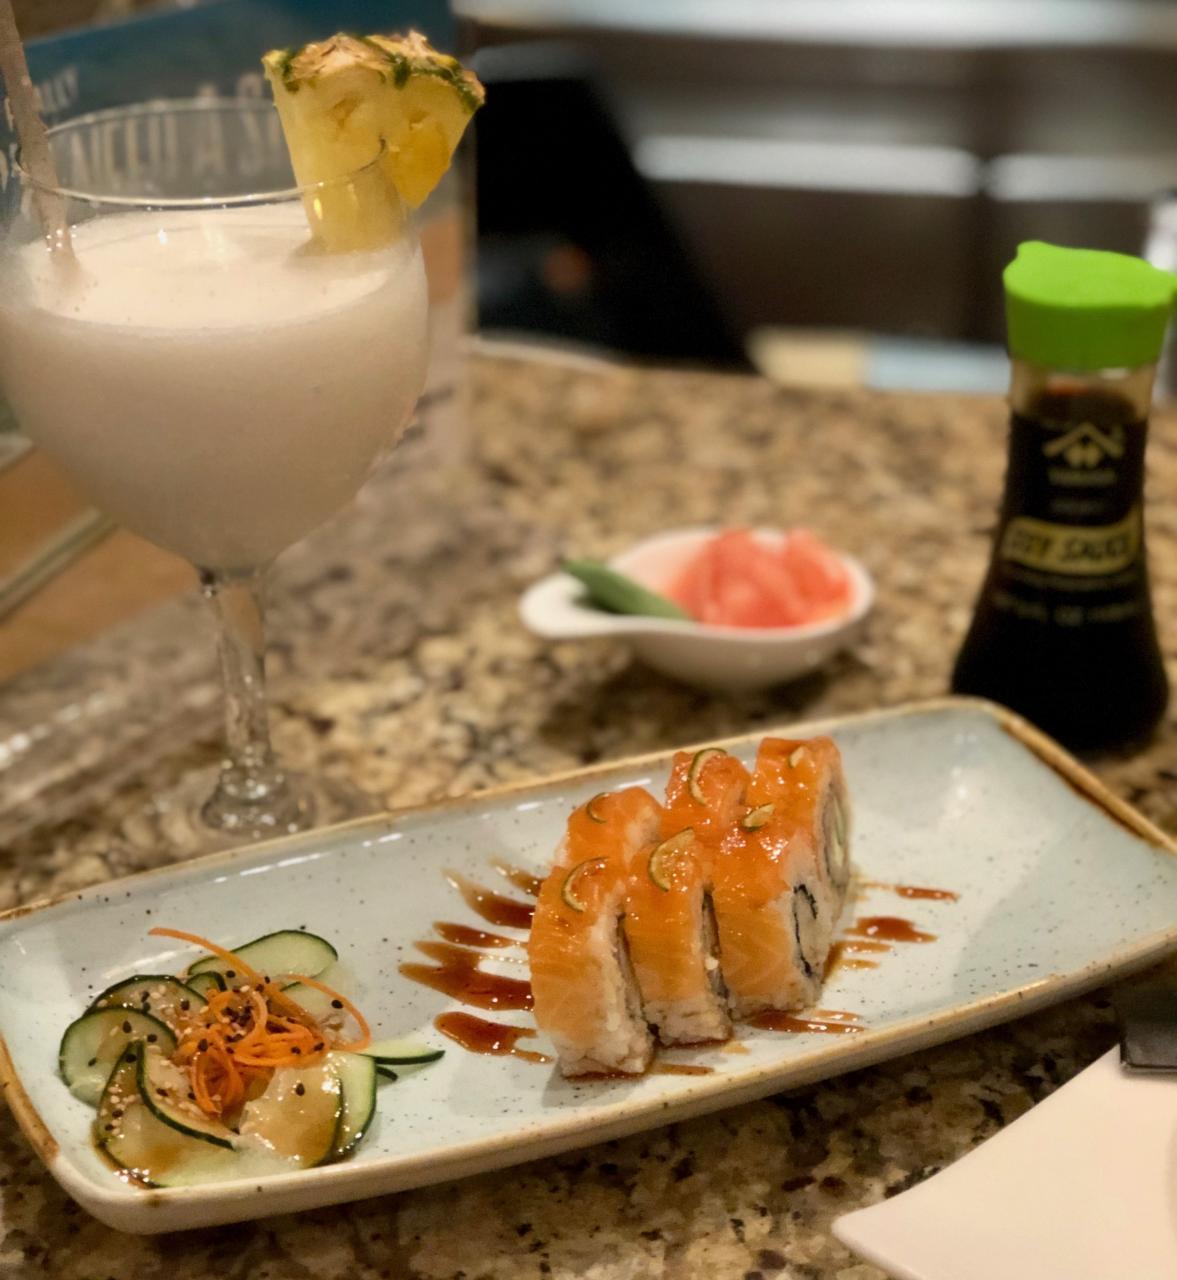 The sushi bar at The Sheraton, was so fresh and so so good!